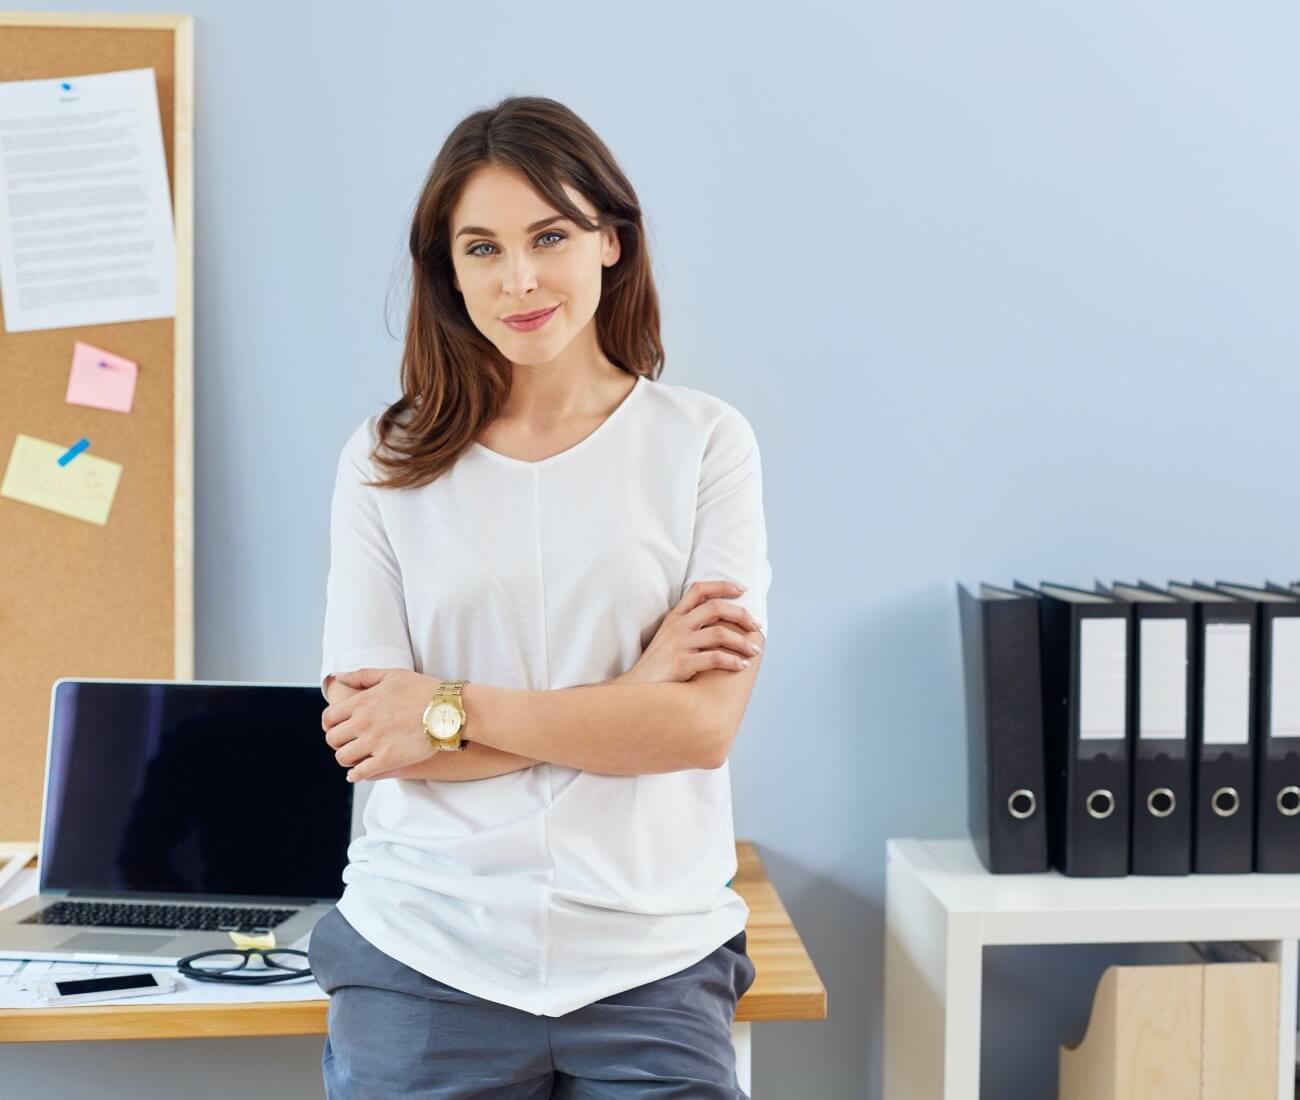 Agency Owner - SMARTcare Software